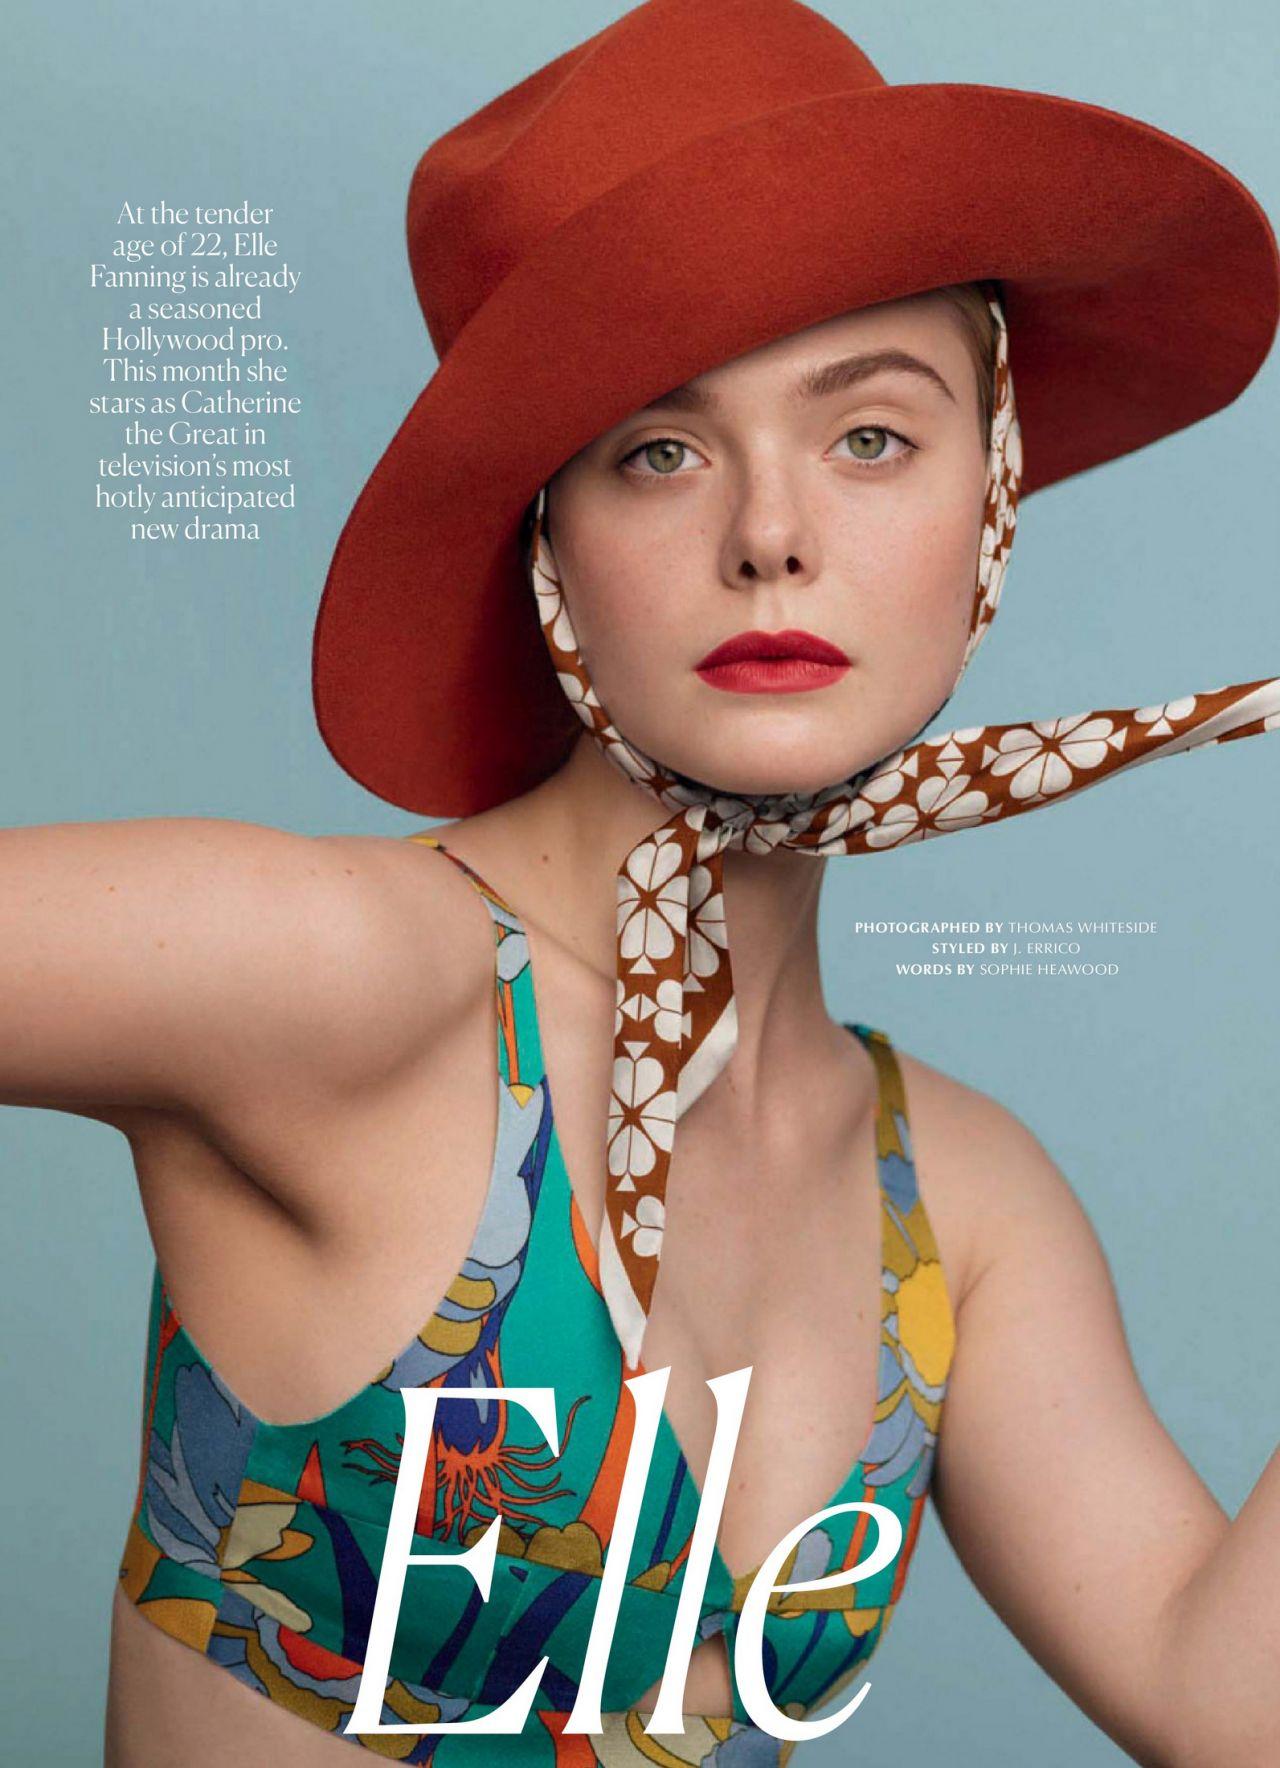 elle-fanning-covers-marie-claire-australia-june-2020-issue